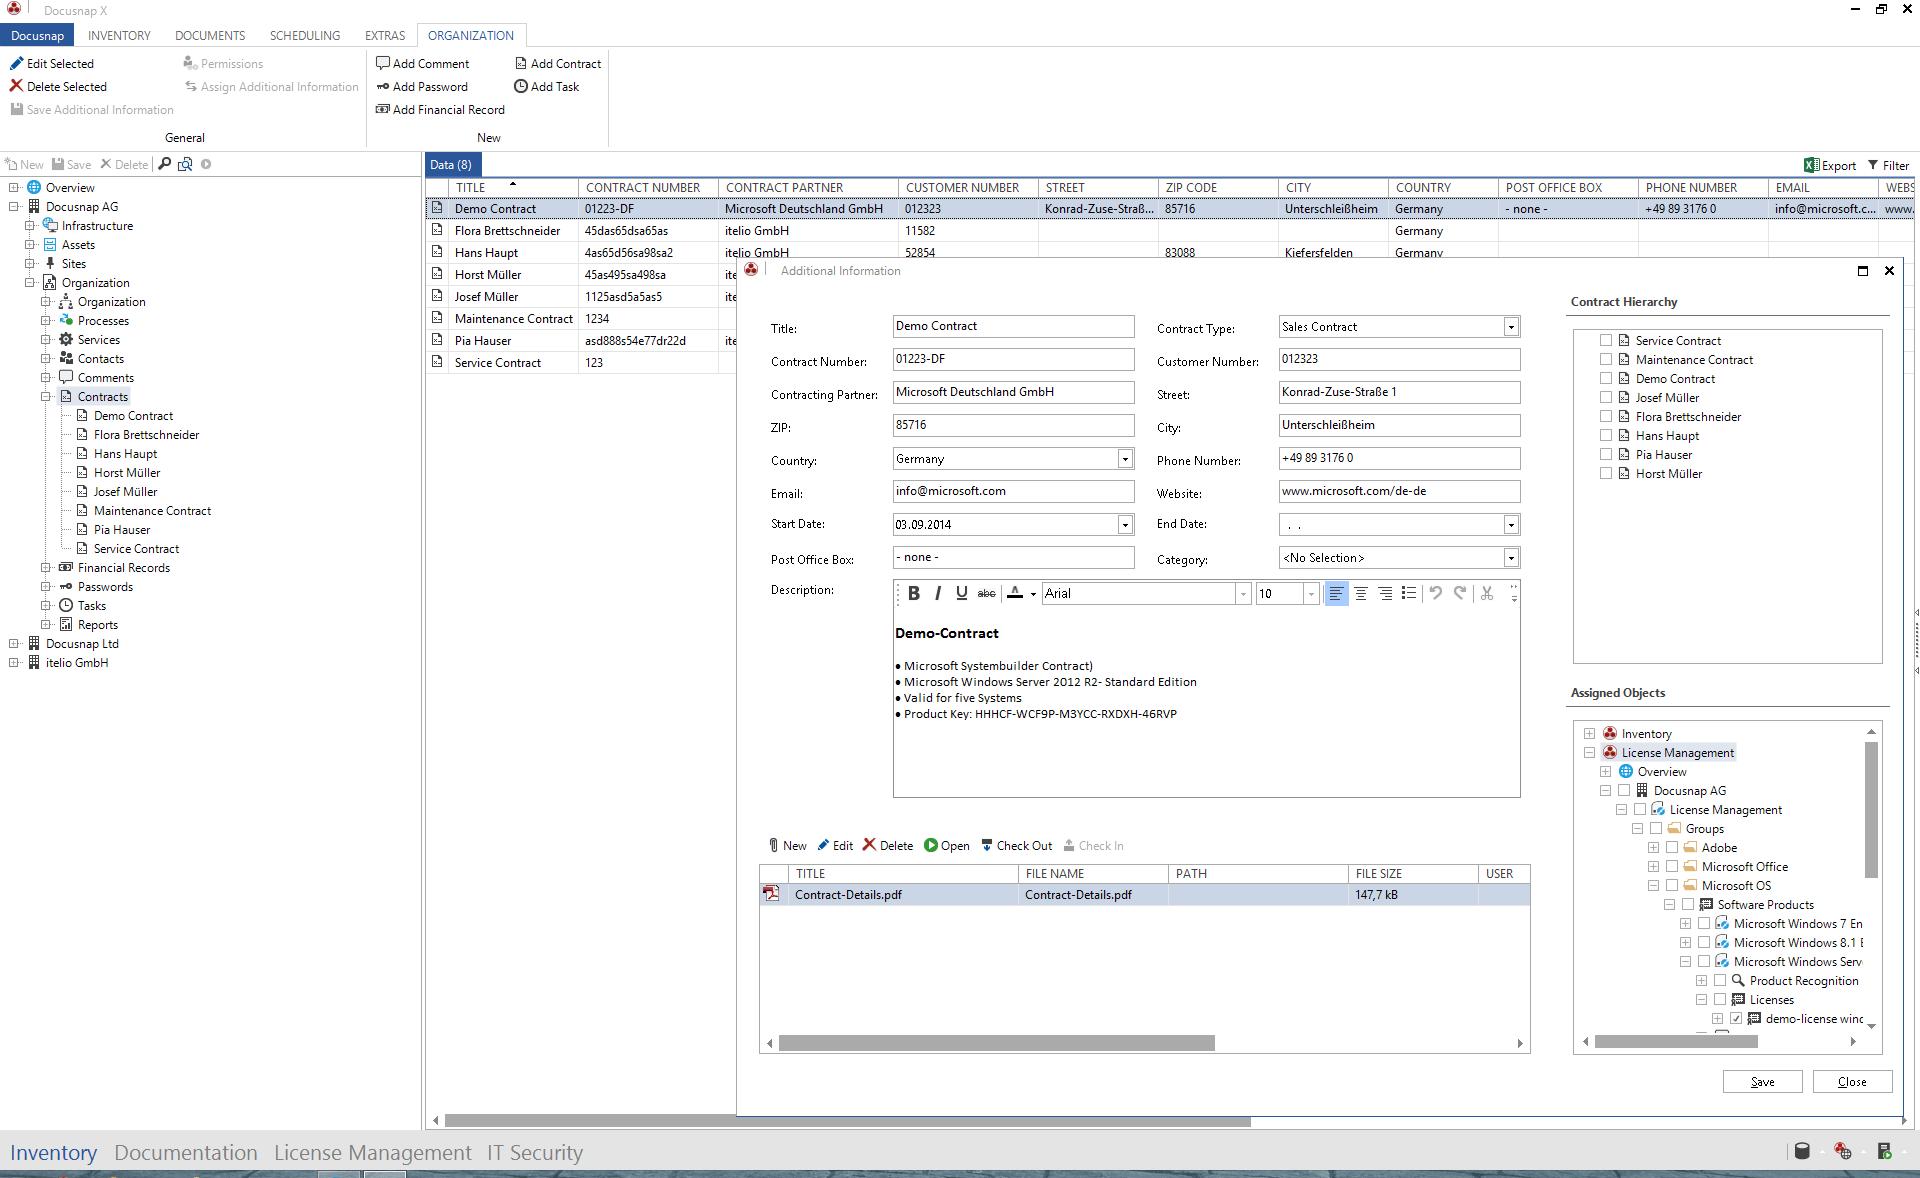 Screenshot: Contract Management